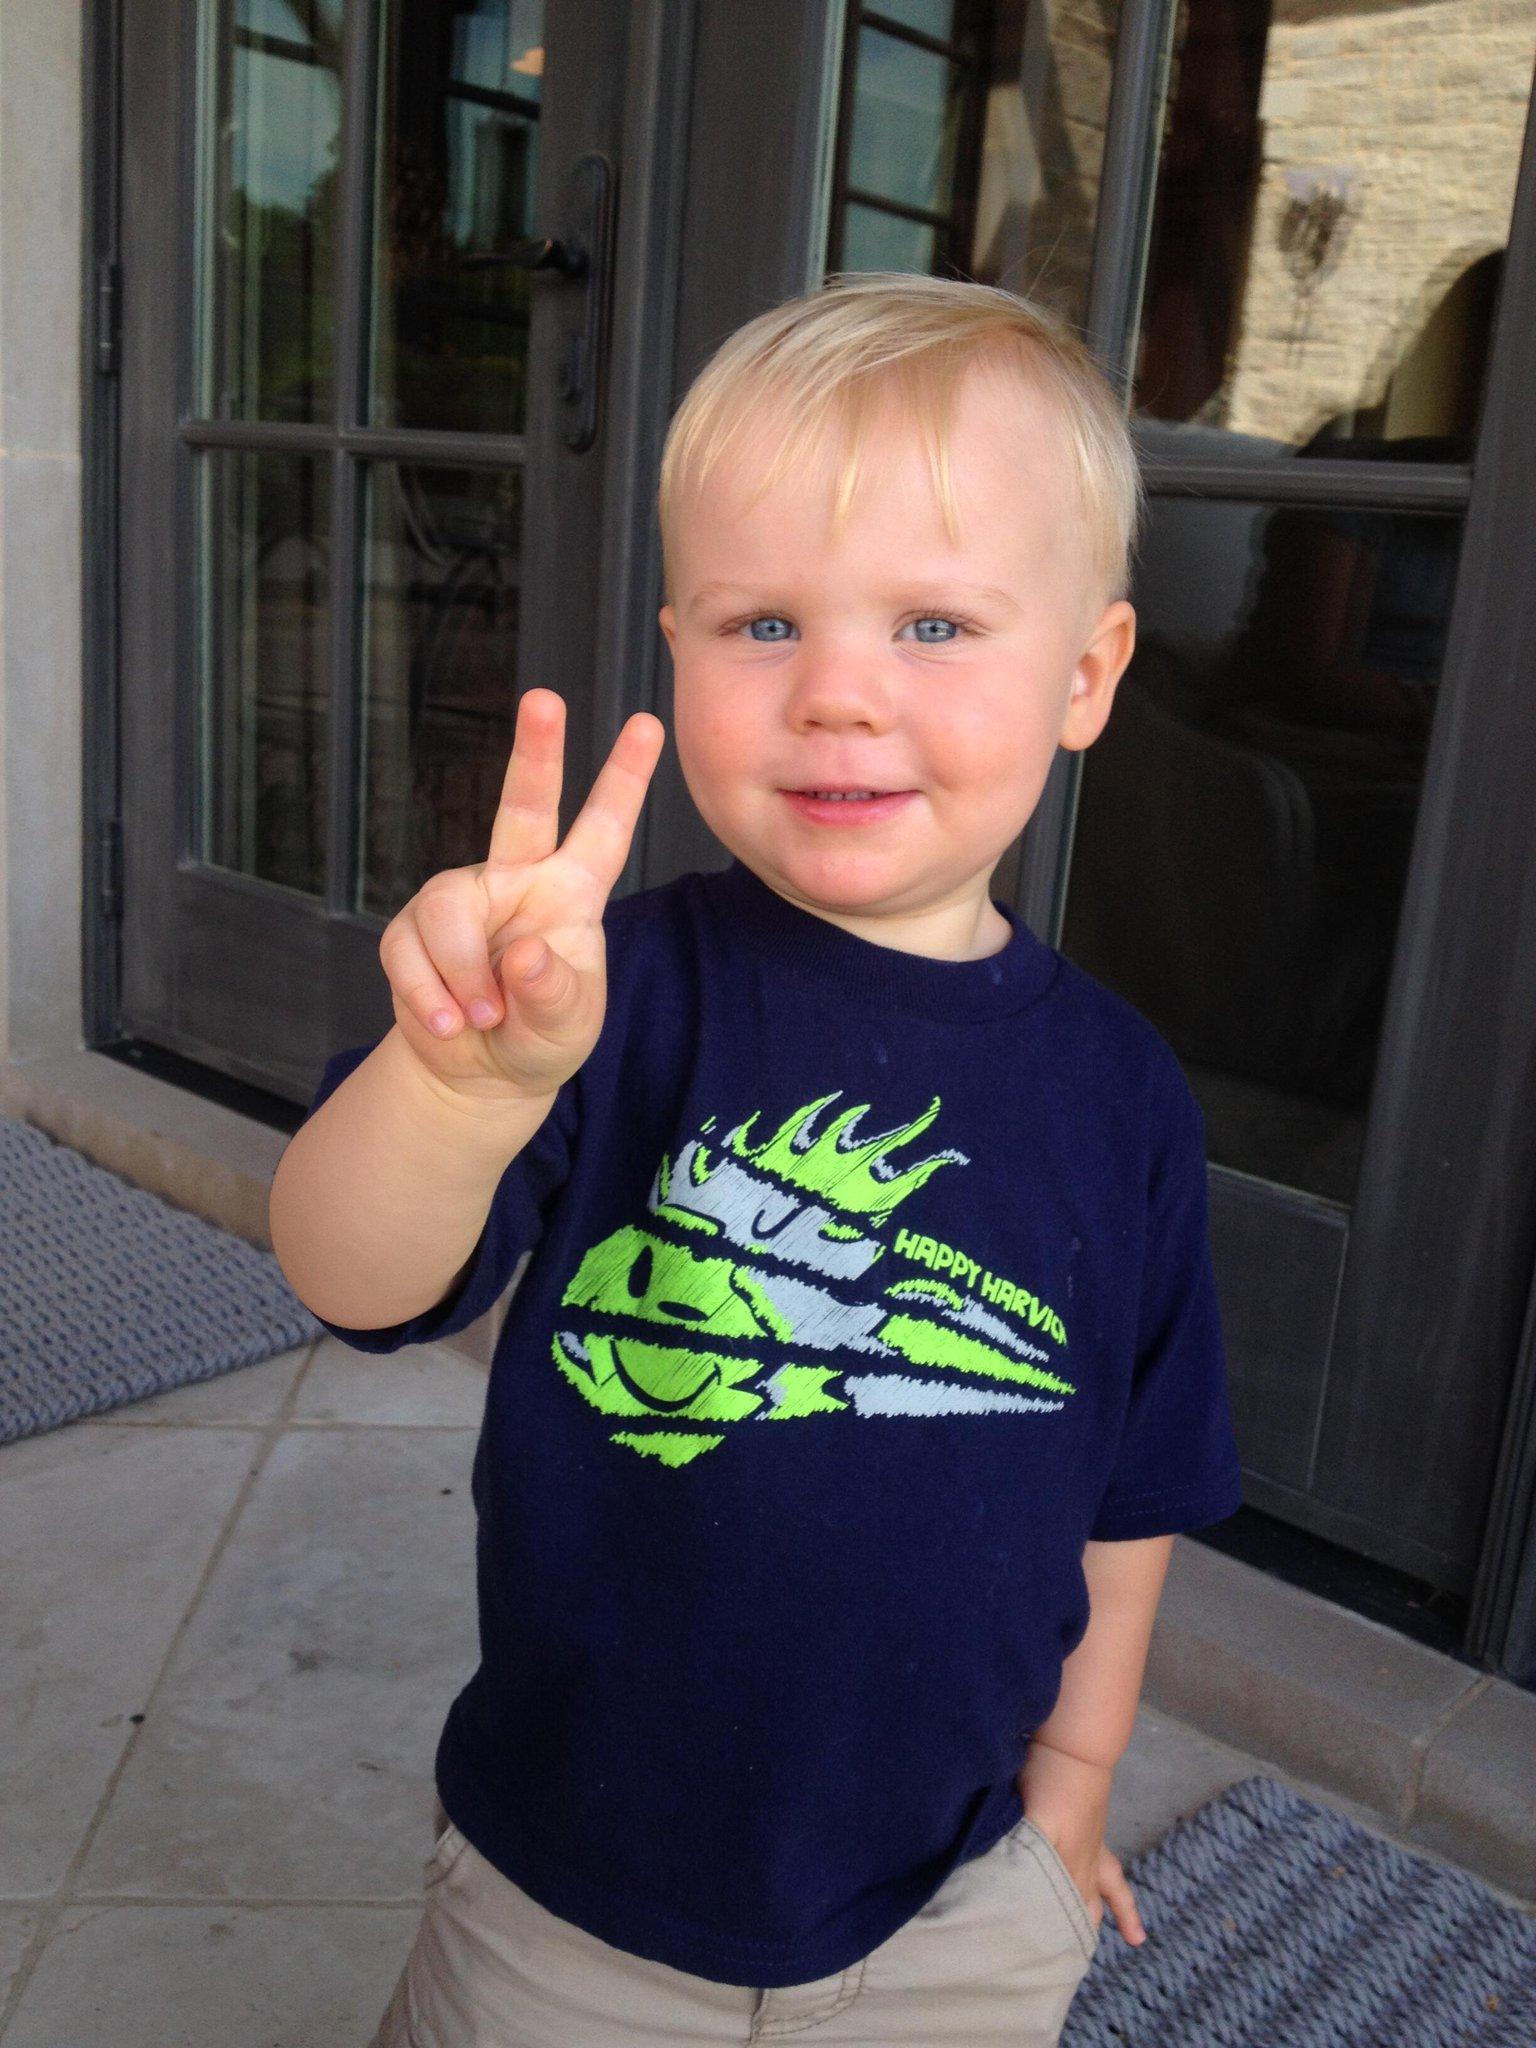 RT @KevinHarvickInc: Happy 2nd birthday to @KeelanHarvick. RT to wish him a happy birthday! http://t.co/XOe7nW3WHN